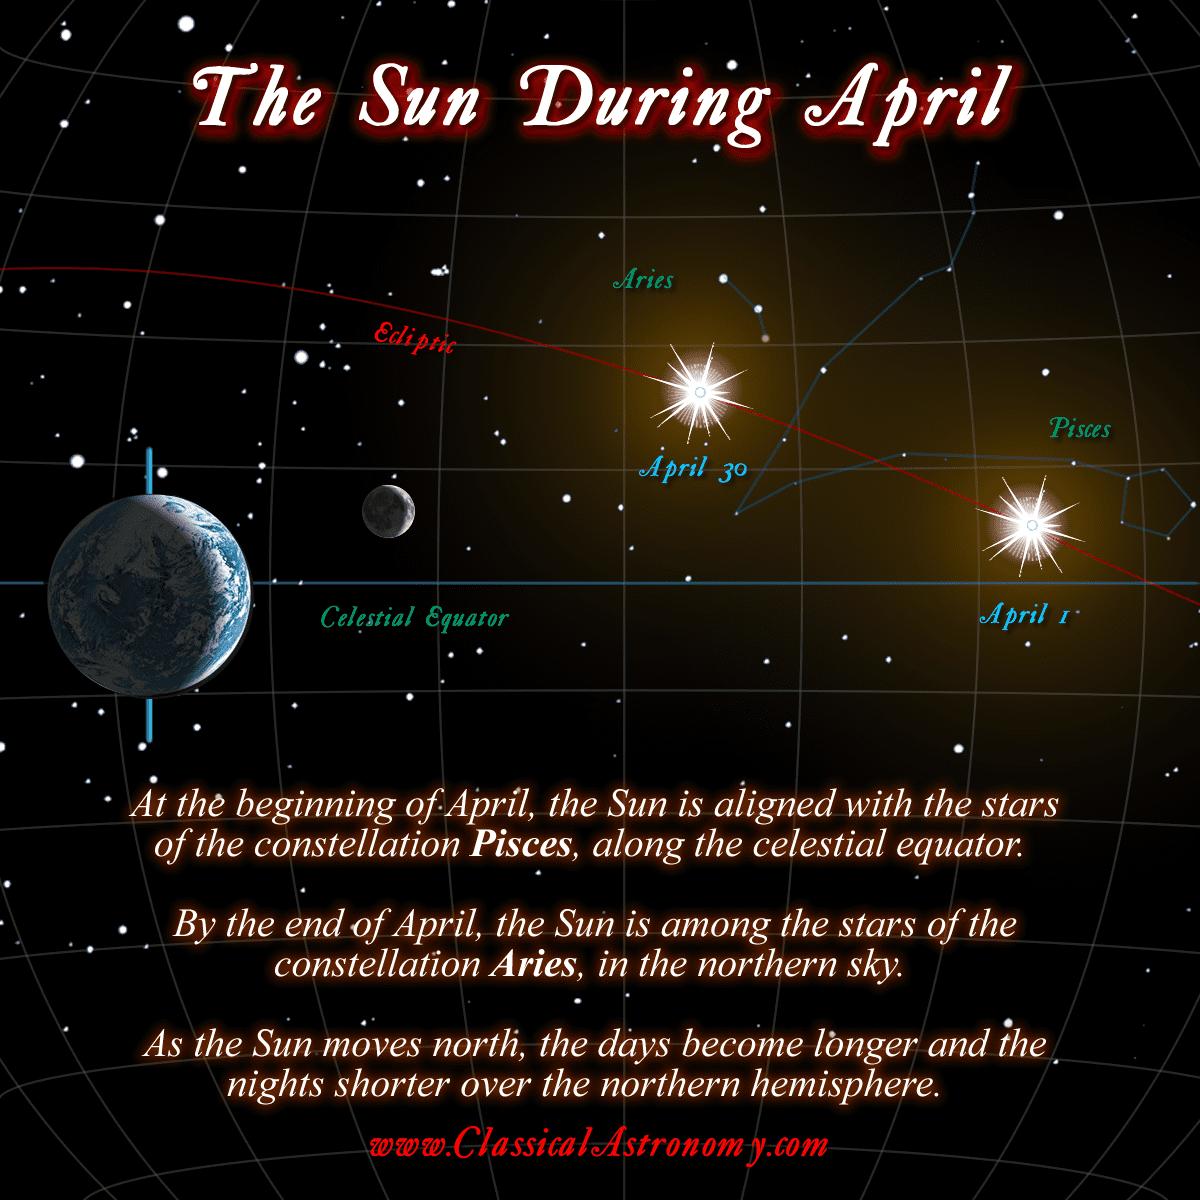 2-CELESTIAL-YEAR-2-April